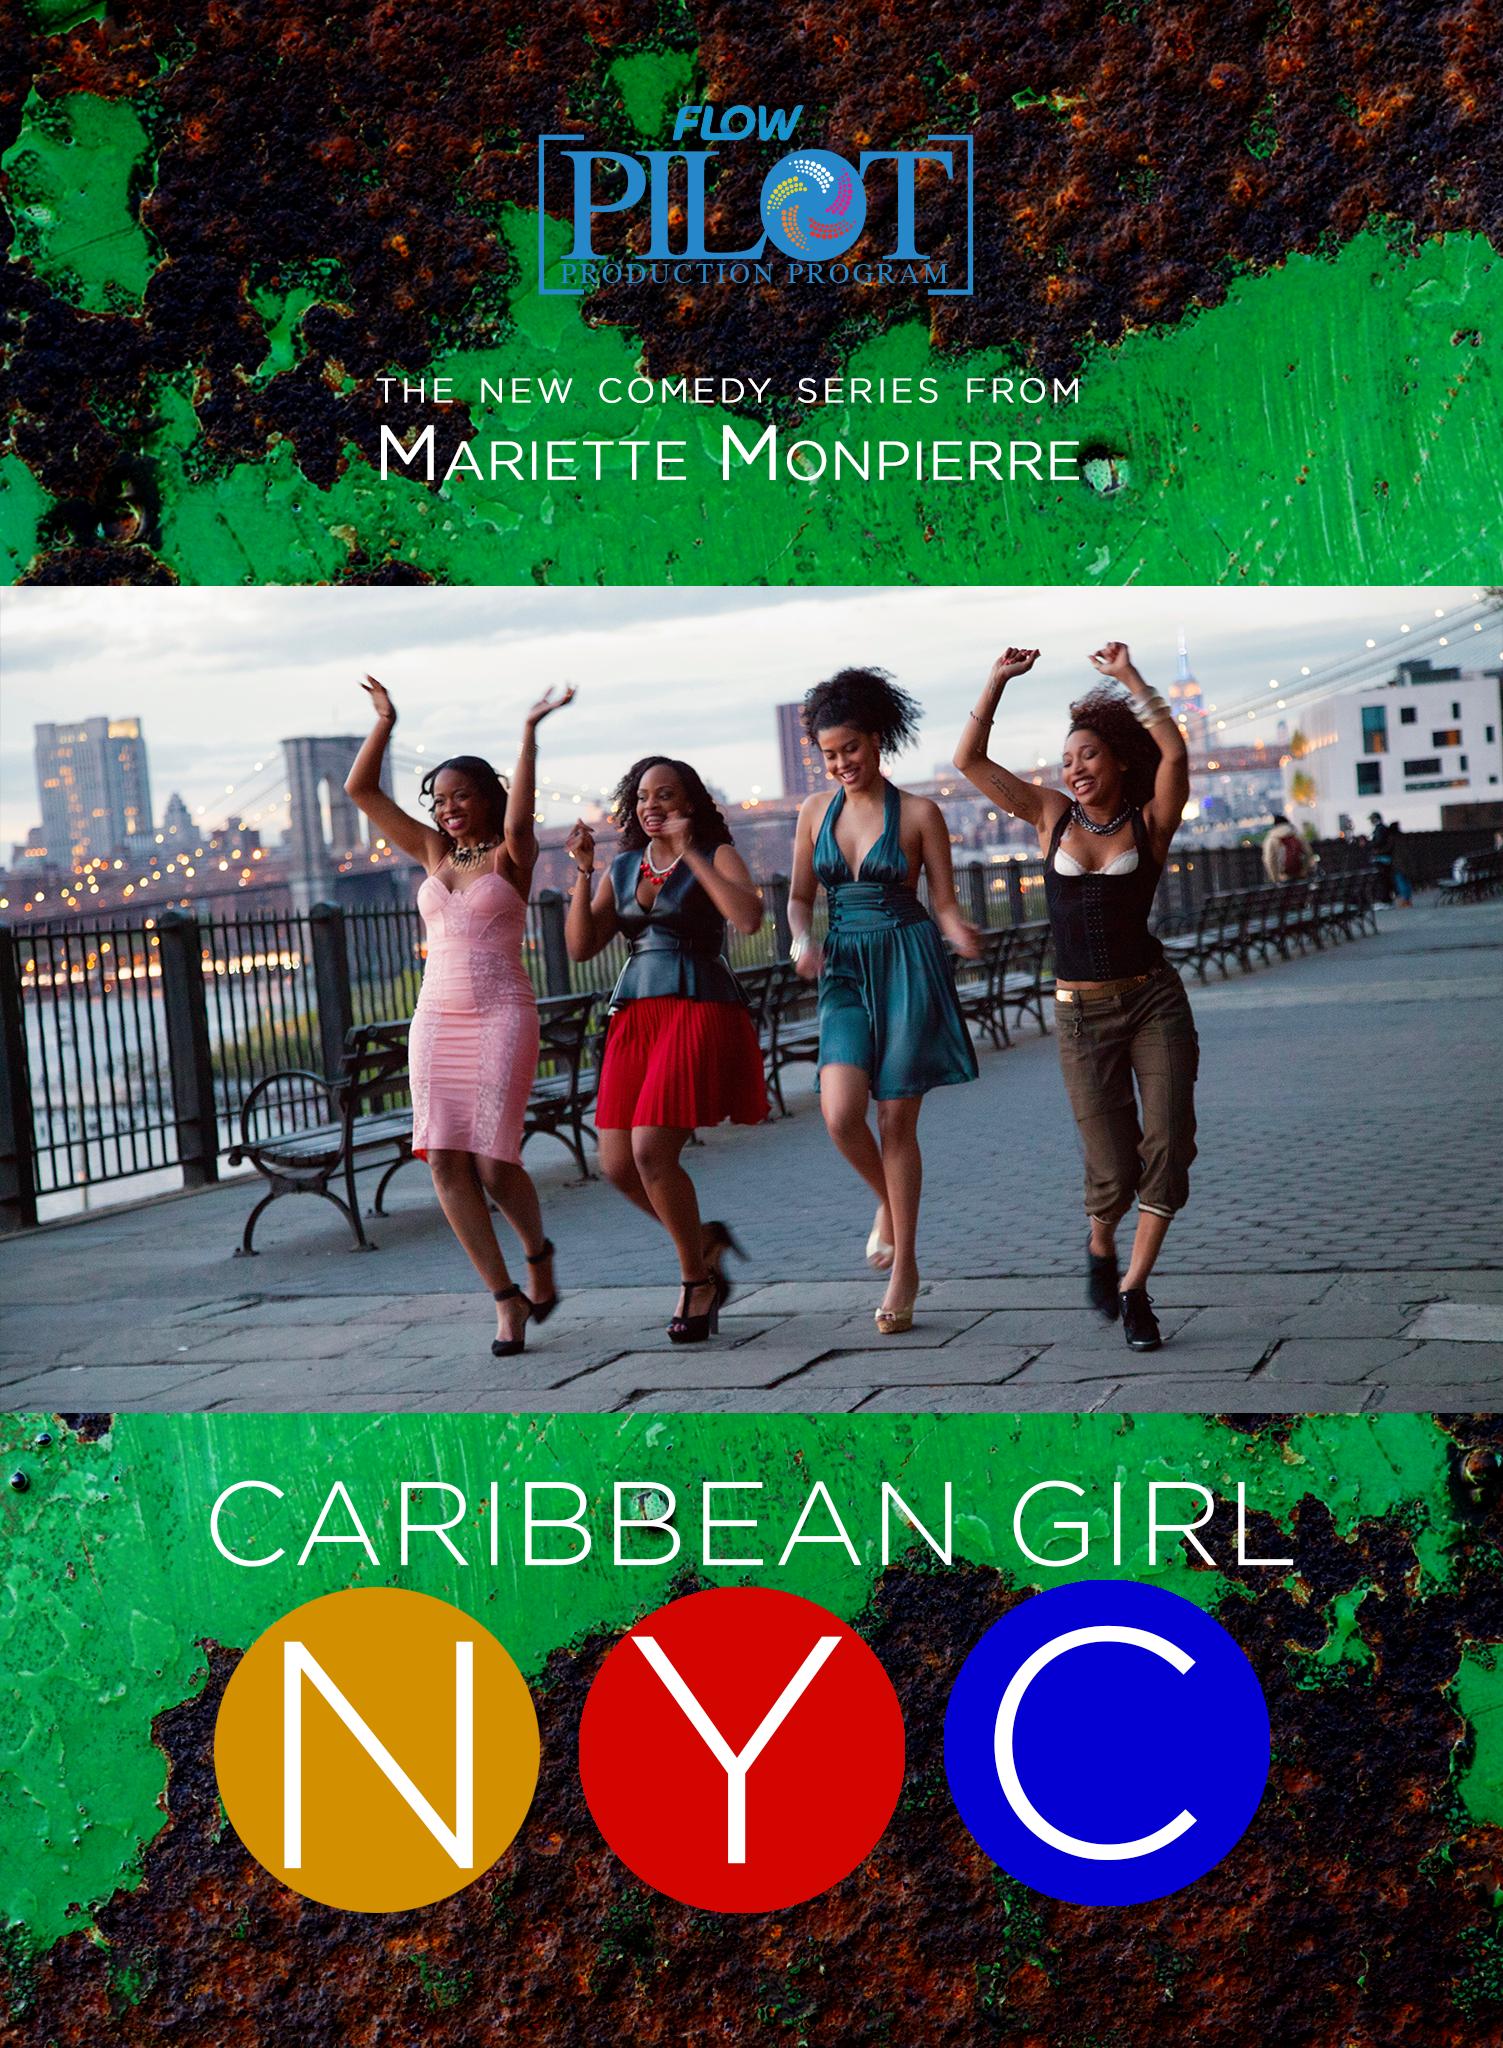 CaribbeanGirlNYC